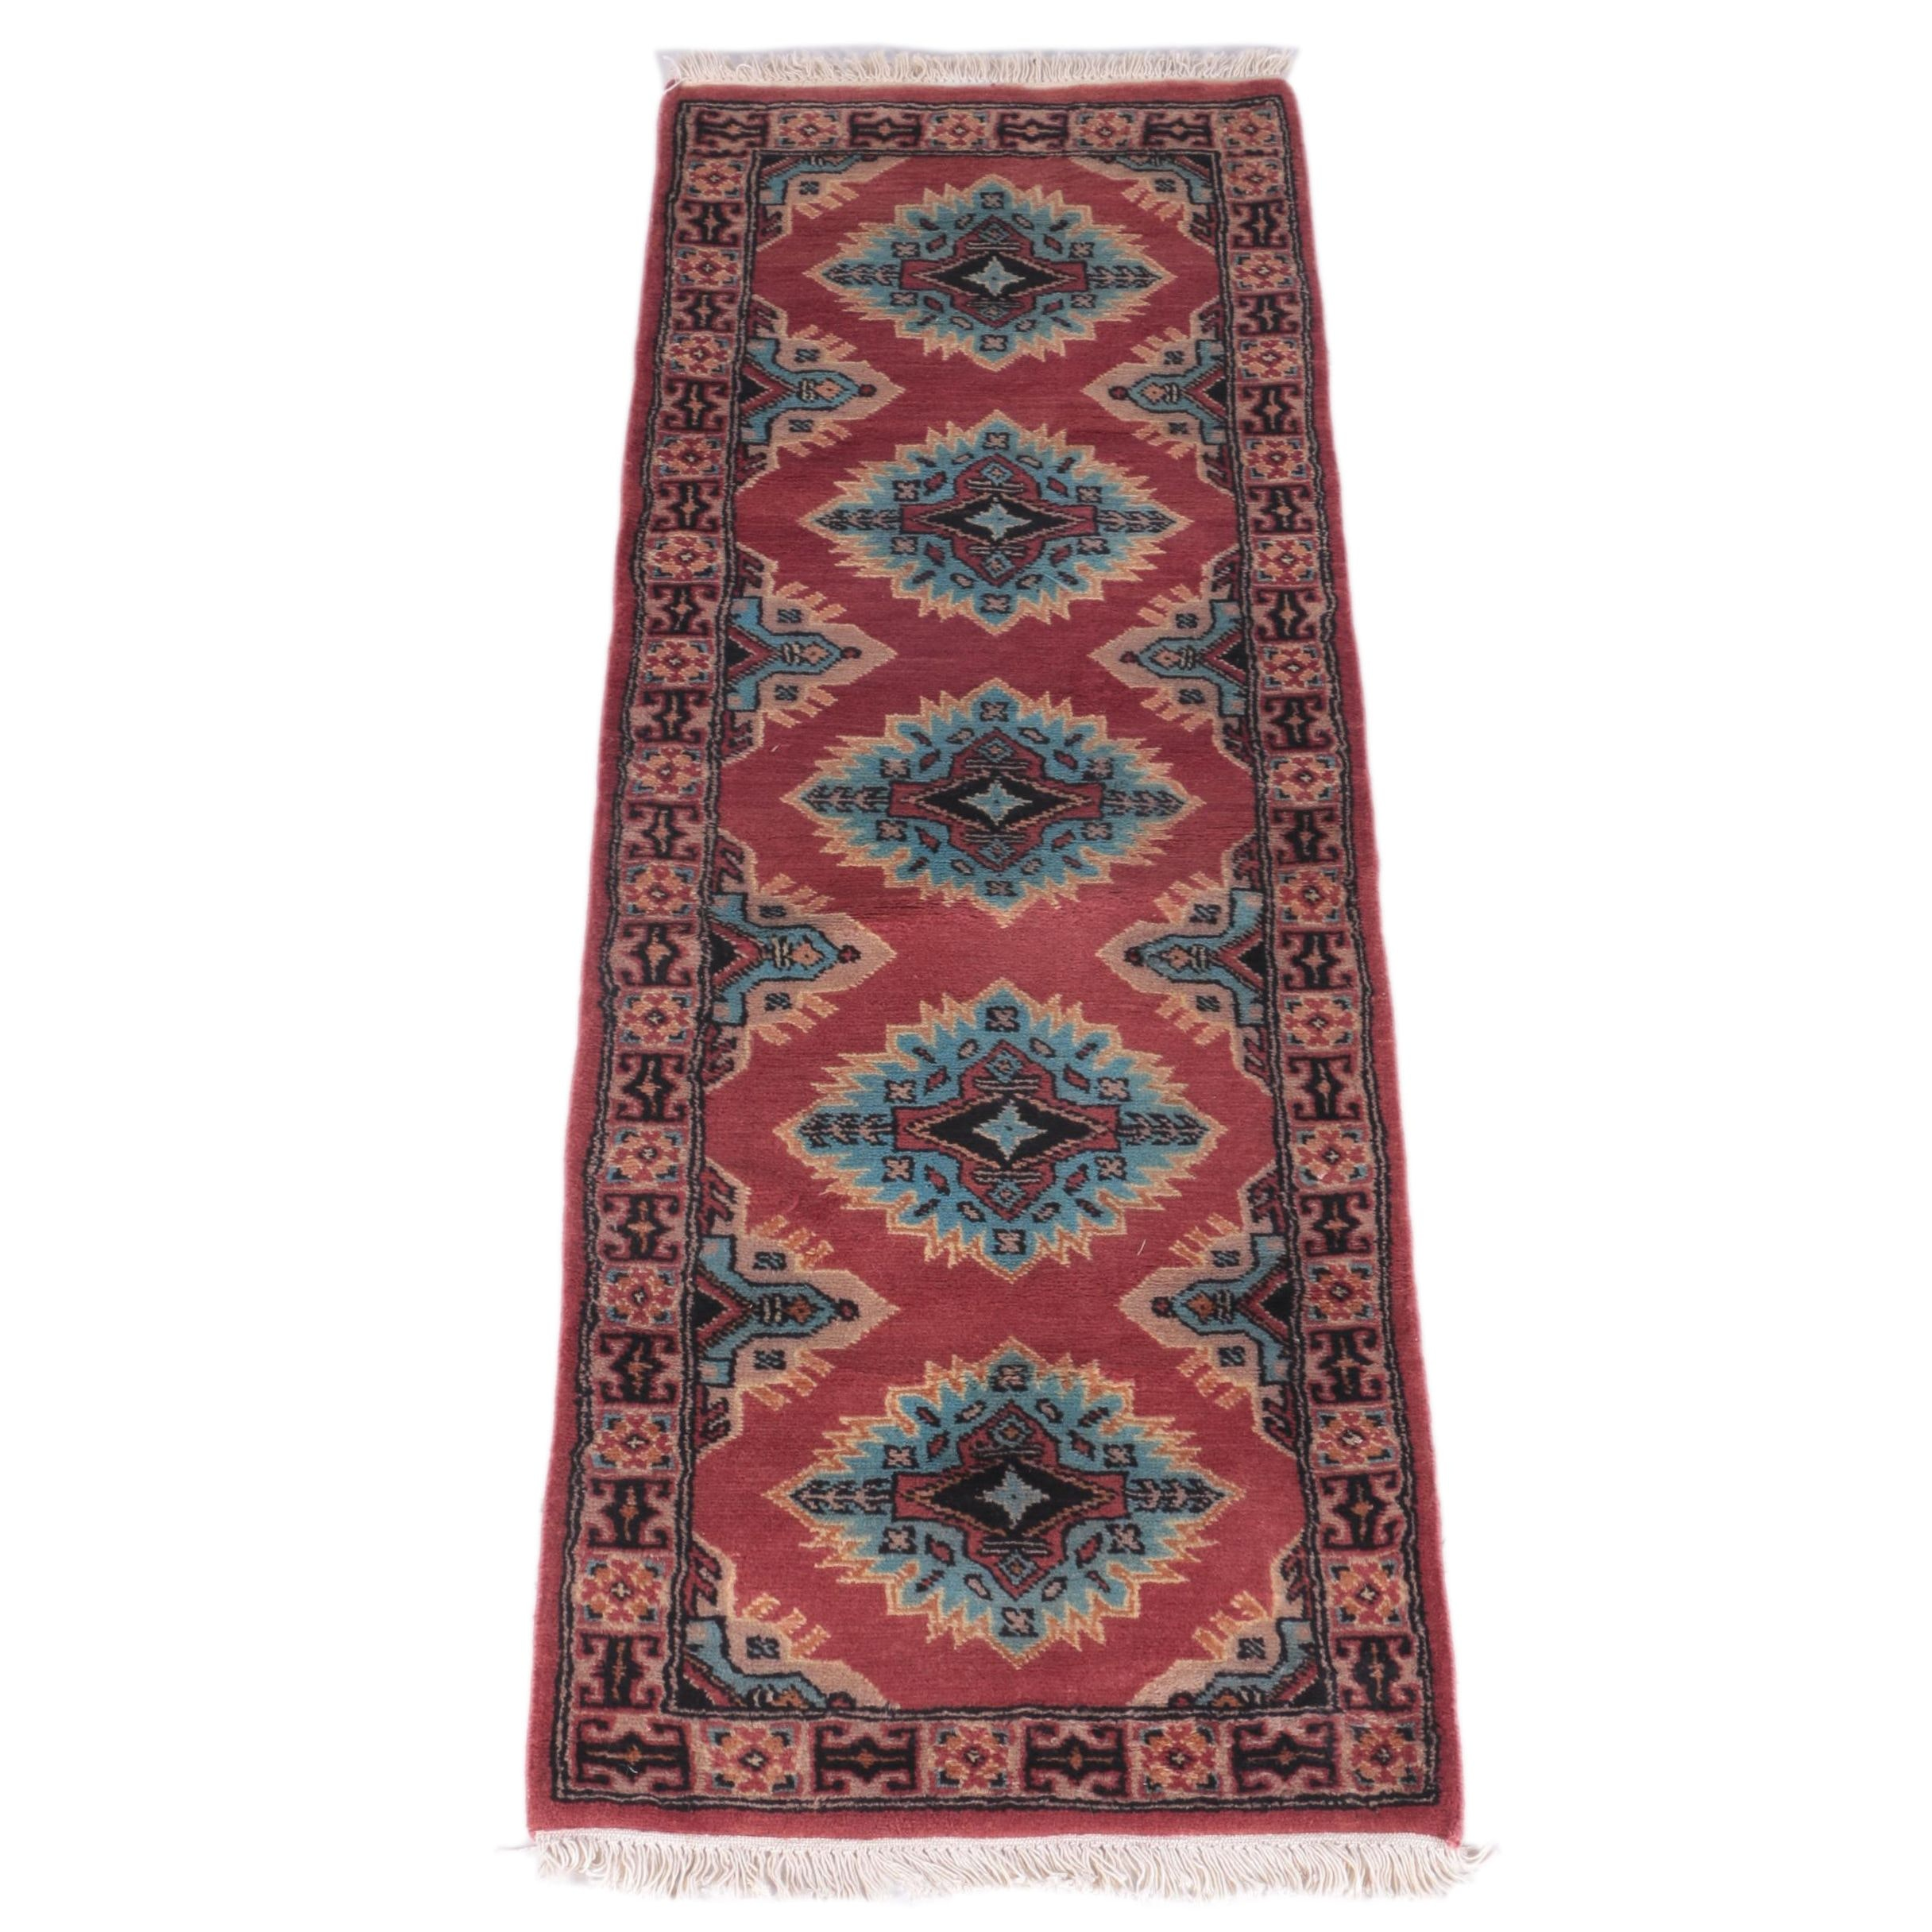 Hand-Knotted Pakistani-Kazak Carpet Runner